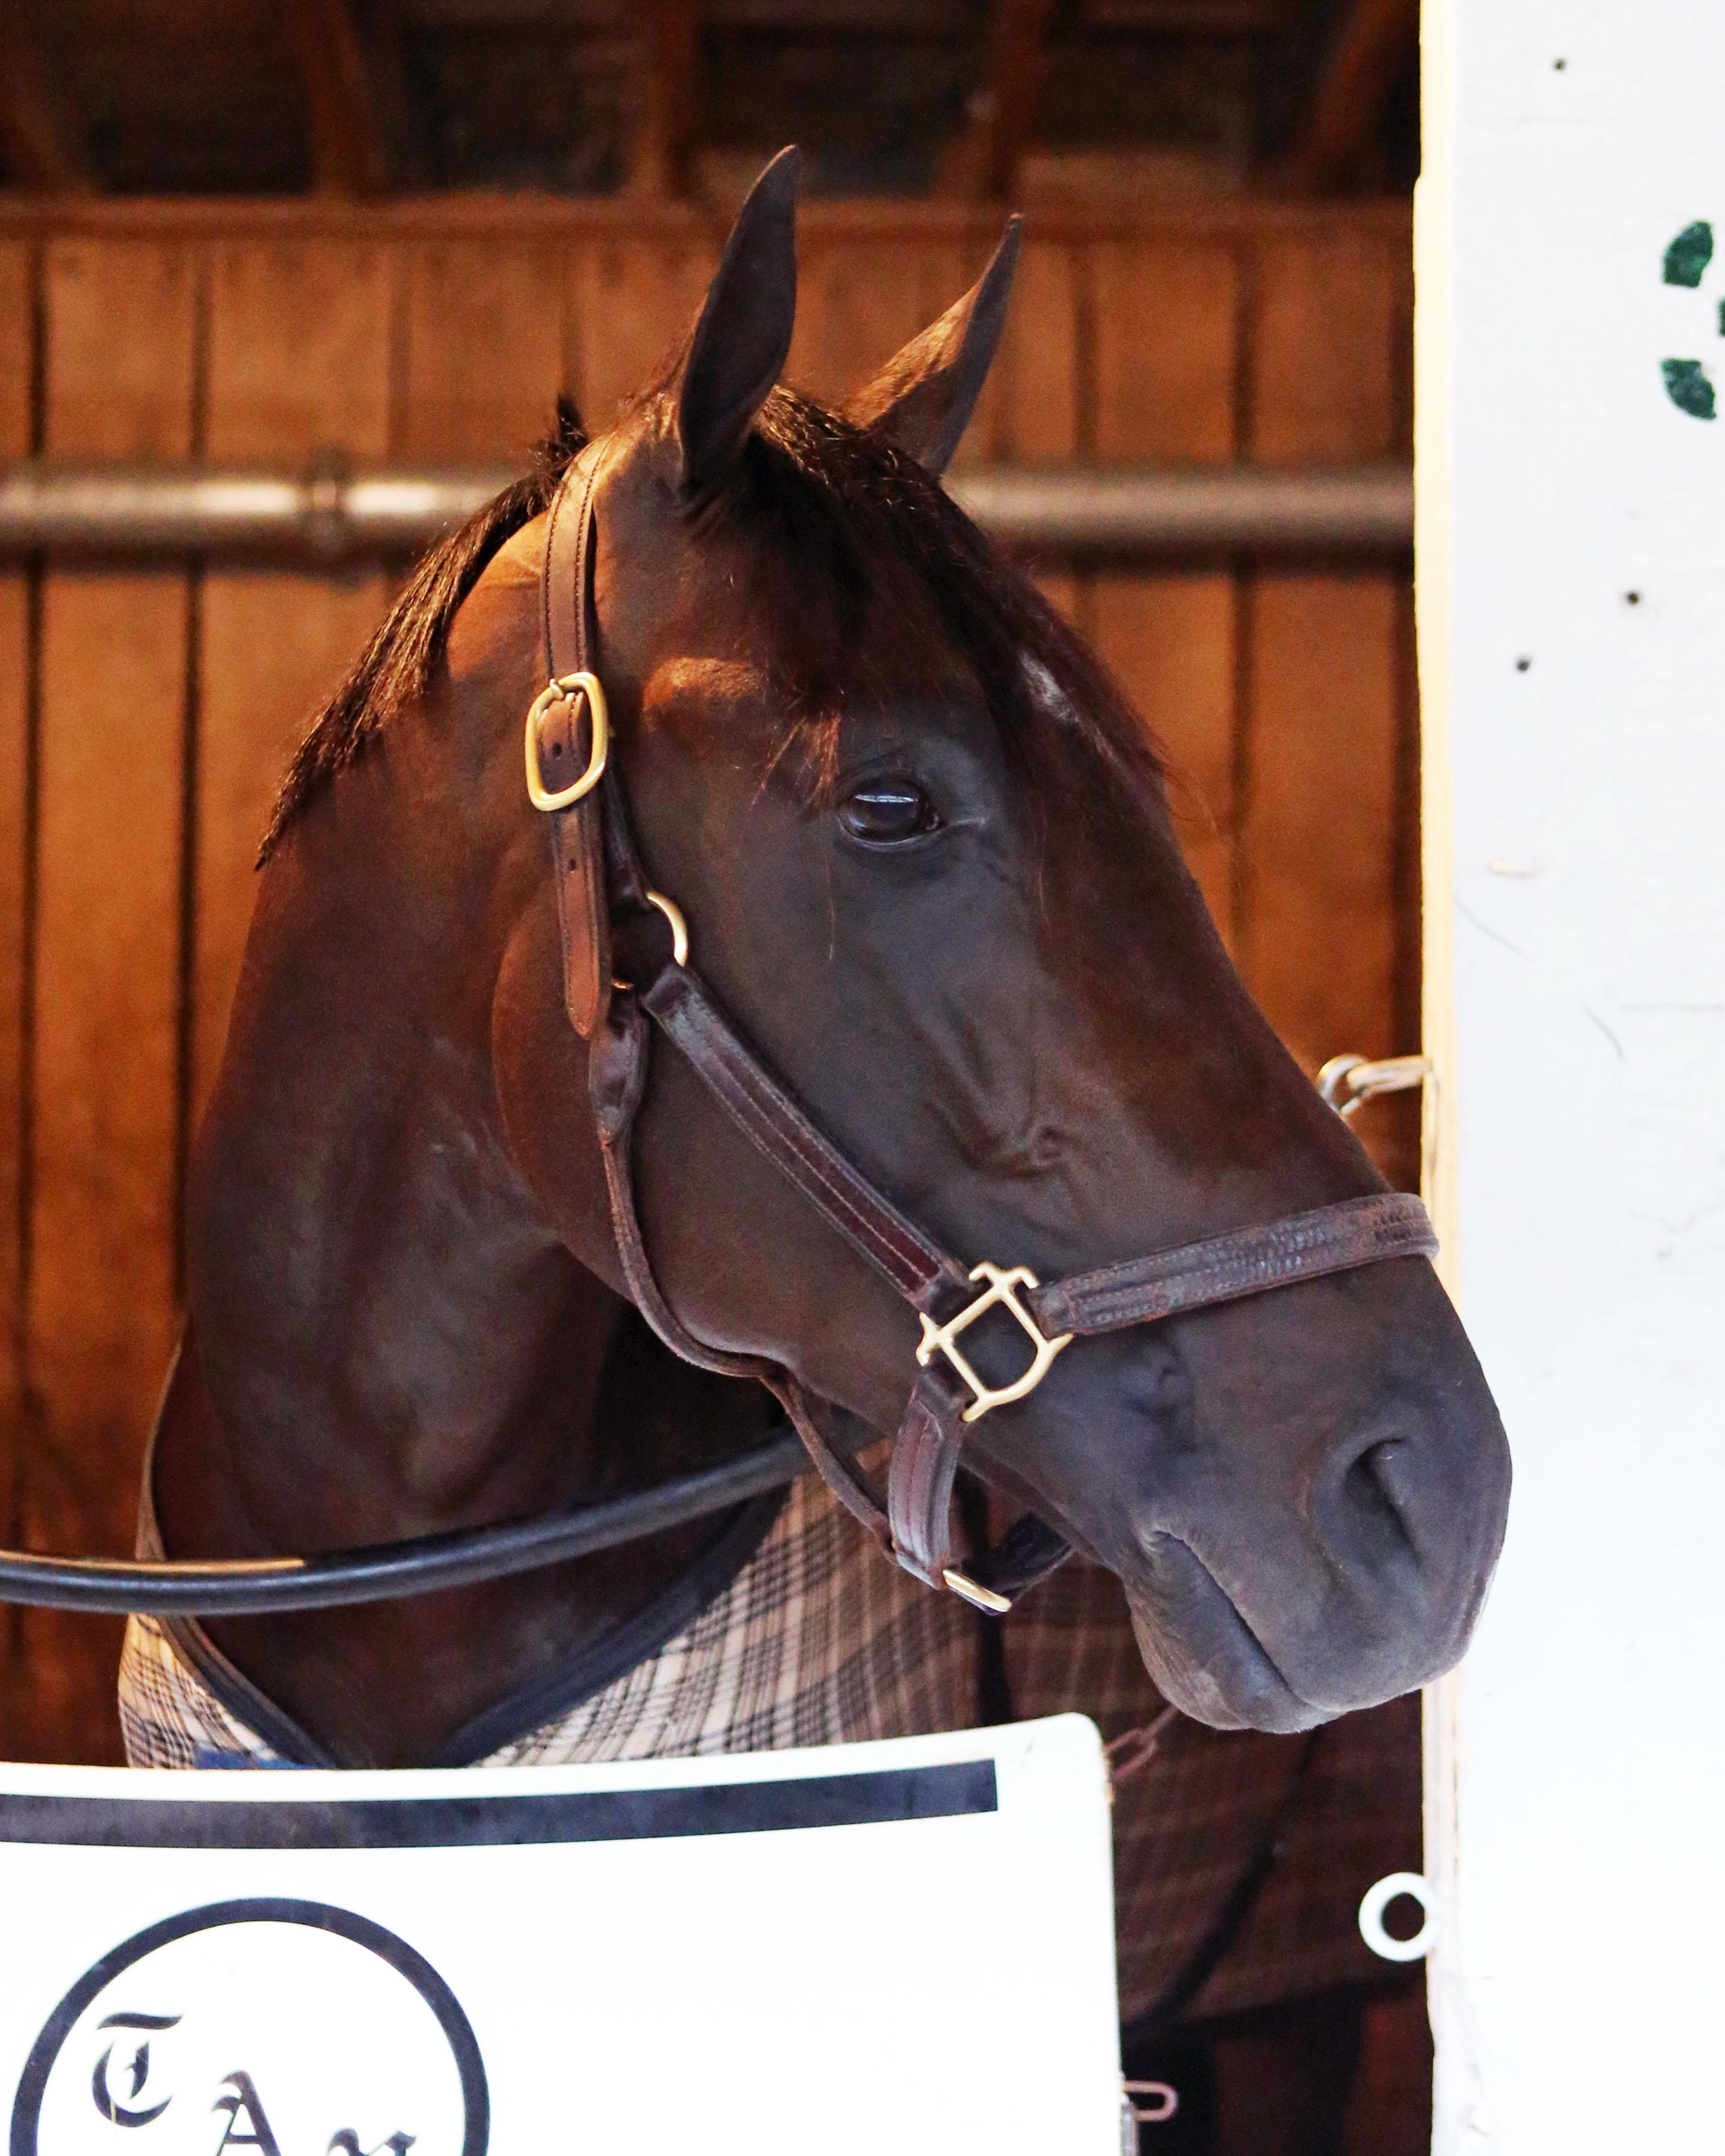 Noble Indy Pletcher Kentucky Derby